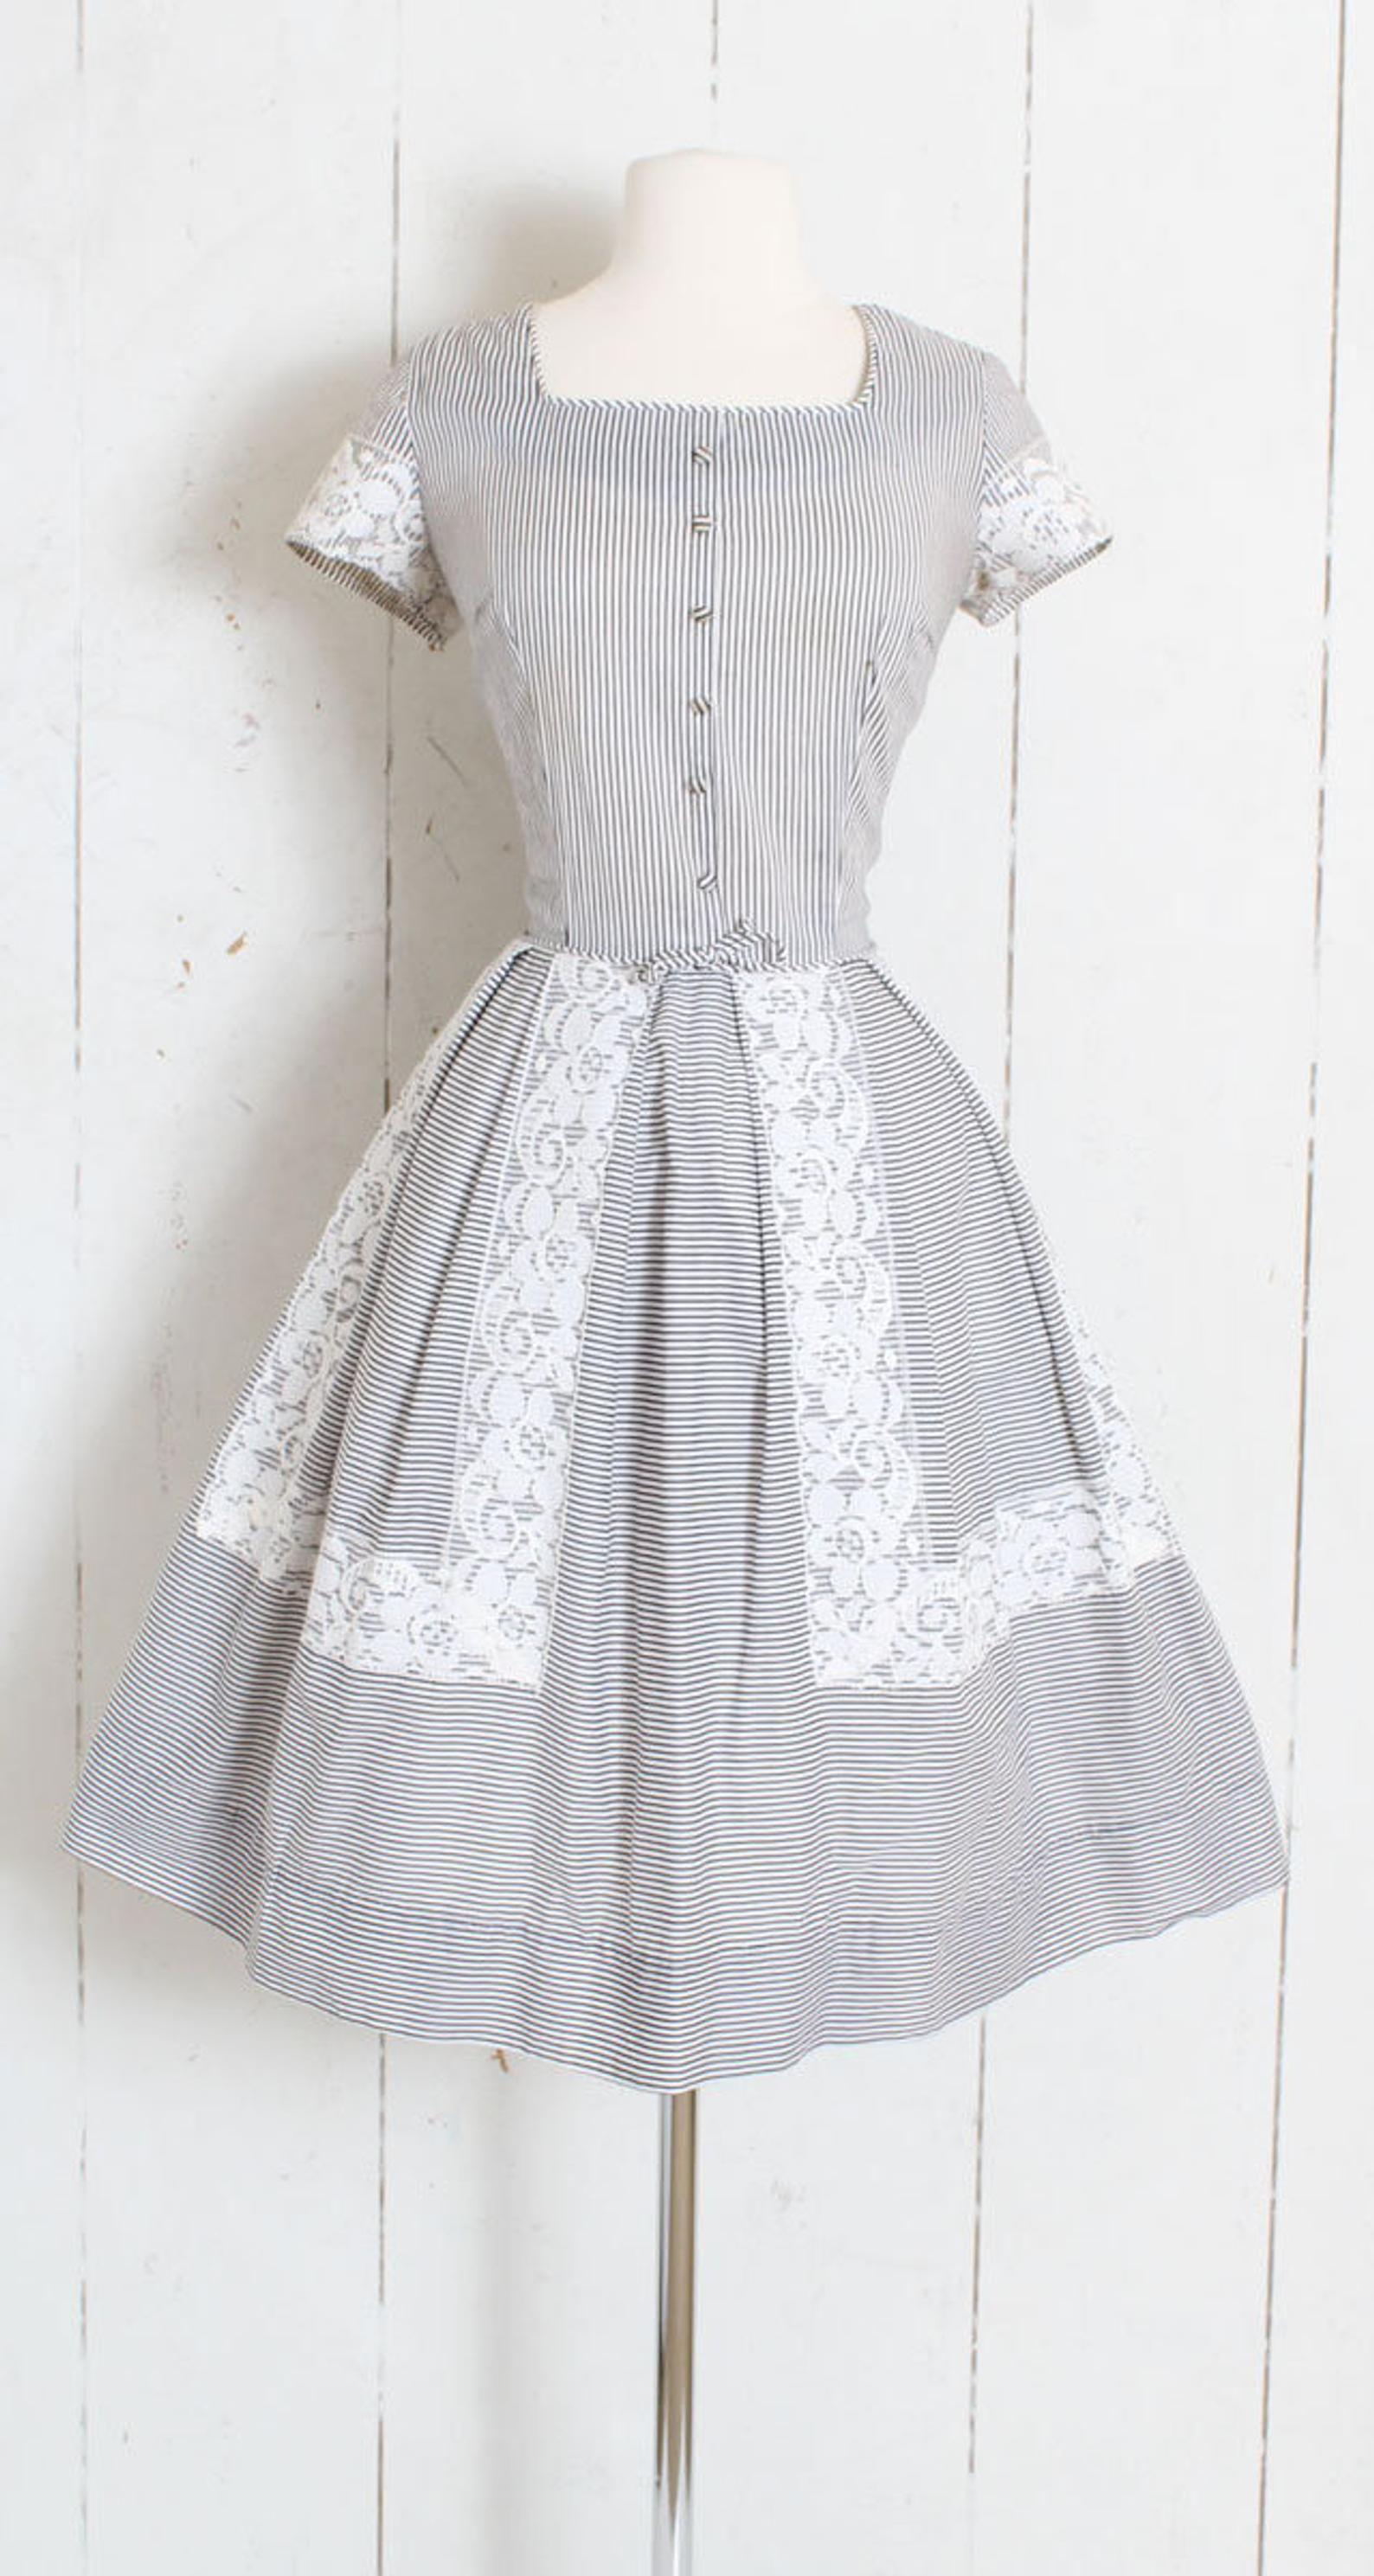 Vintage 1950s 50s Dress White Black Striped Lace Cotton Etsy Vintage Dresses 50s Dresses 50s Dresses [ 2978 x 1588 Pixel ]